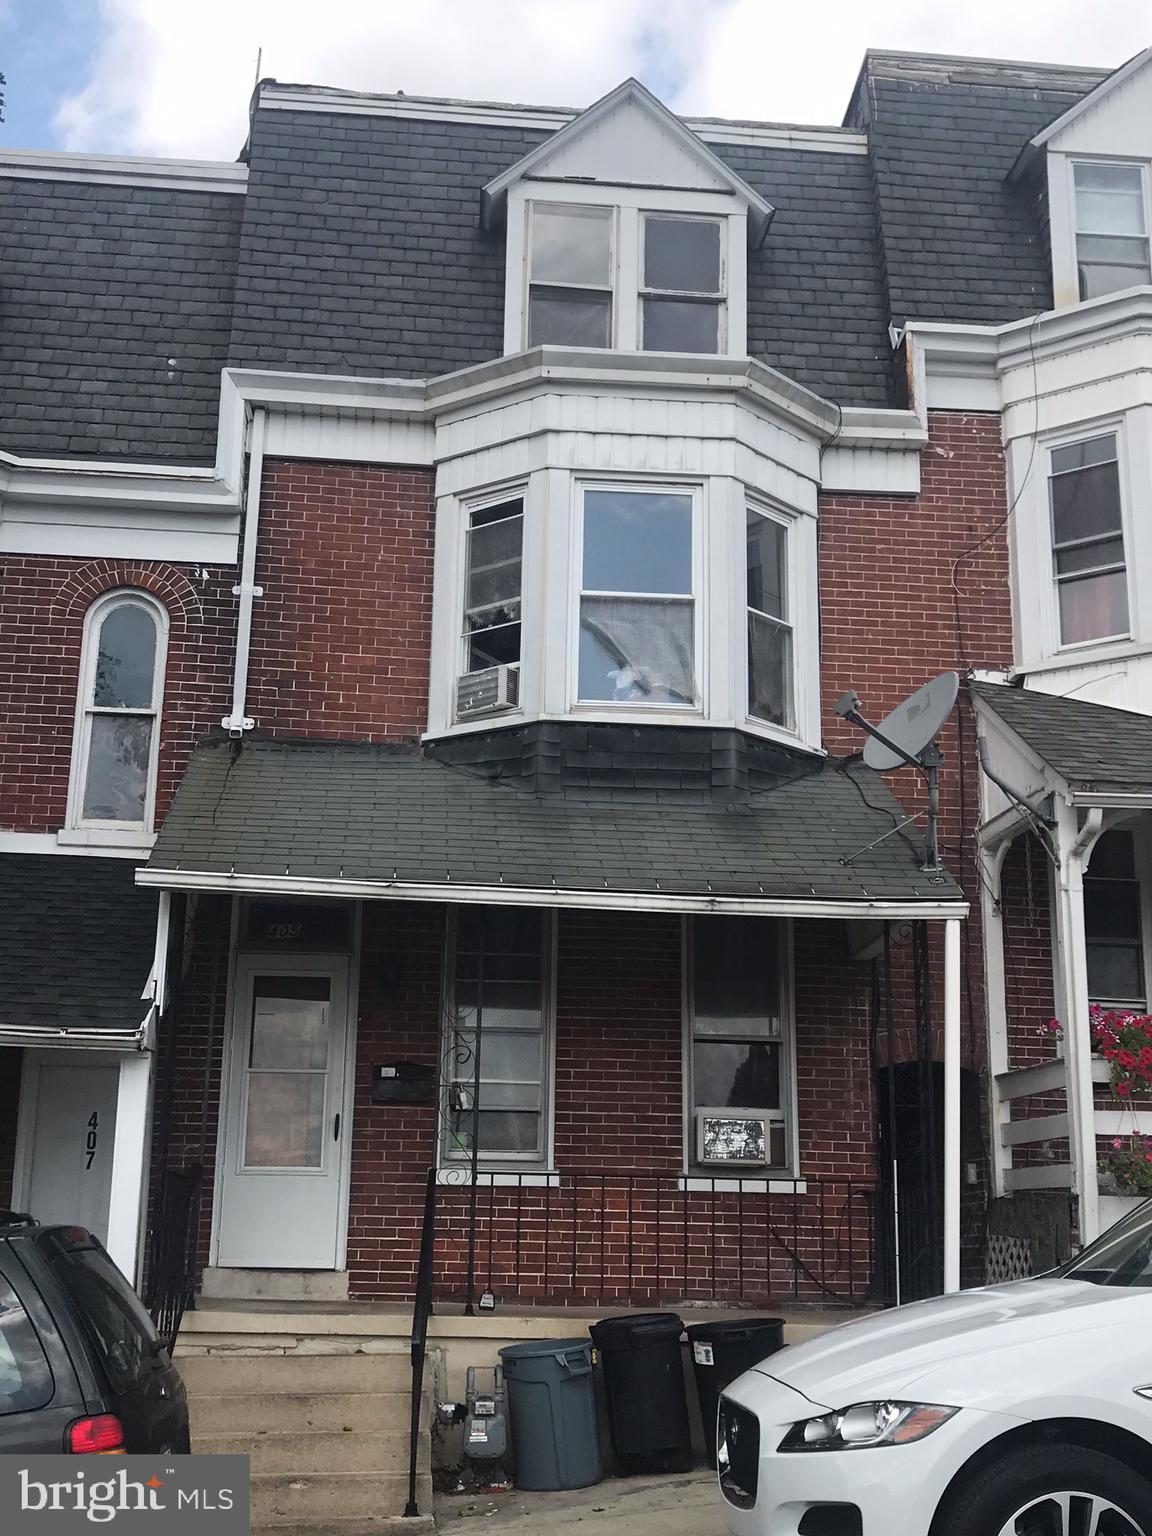 405 W NORTH STREET, YORK, PA 17401